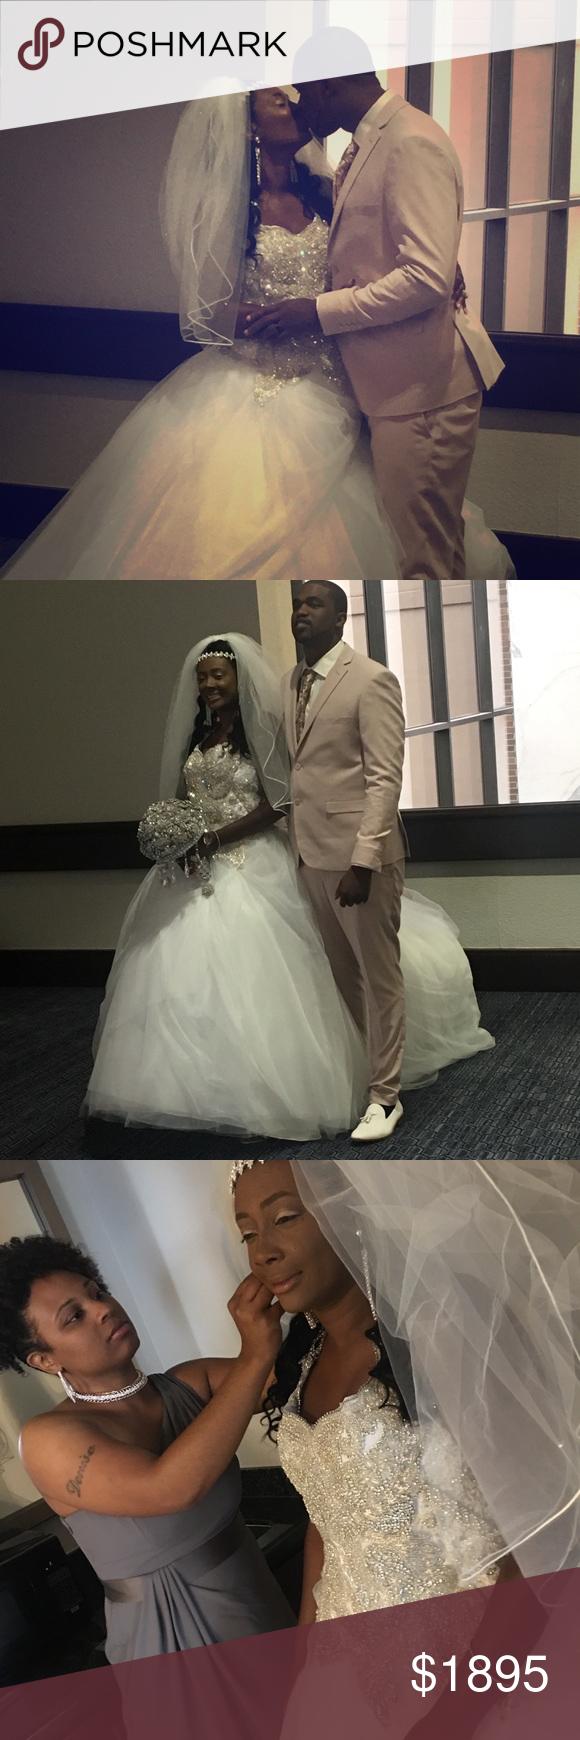 Build your own wedding dress  Customized bling wedding dress Boutique  My Posh Picks  Pinterest